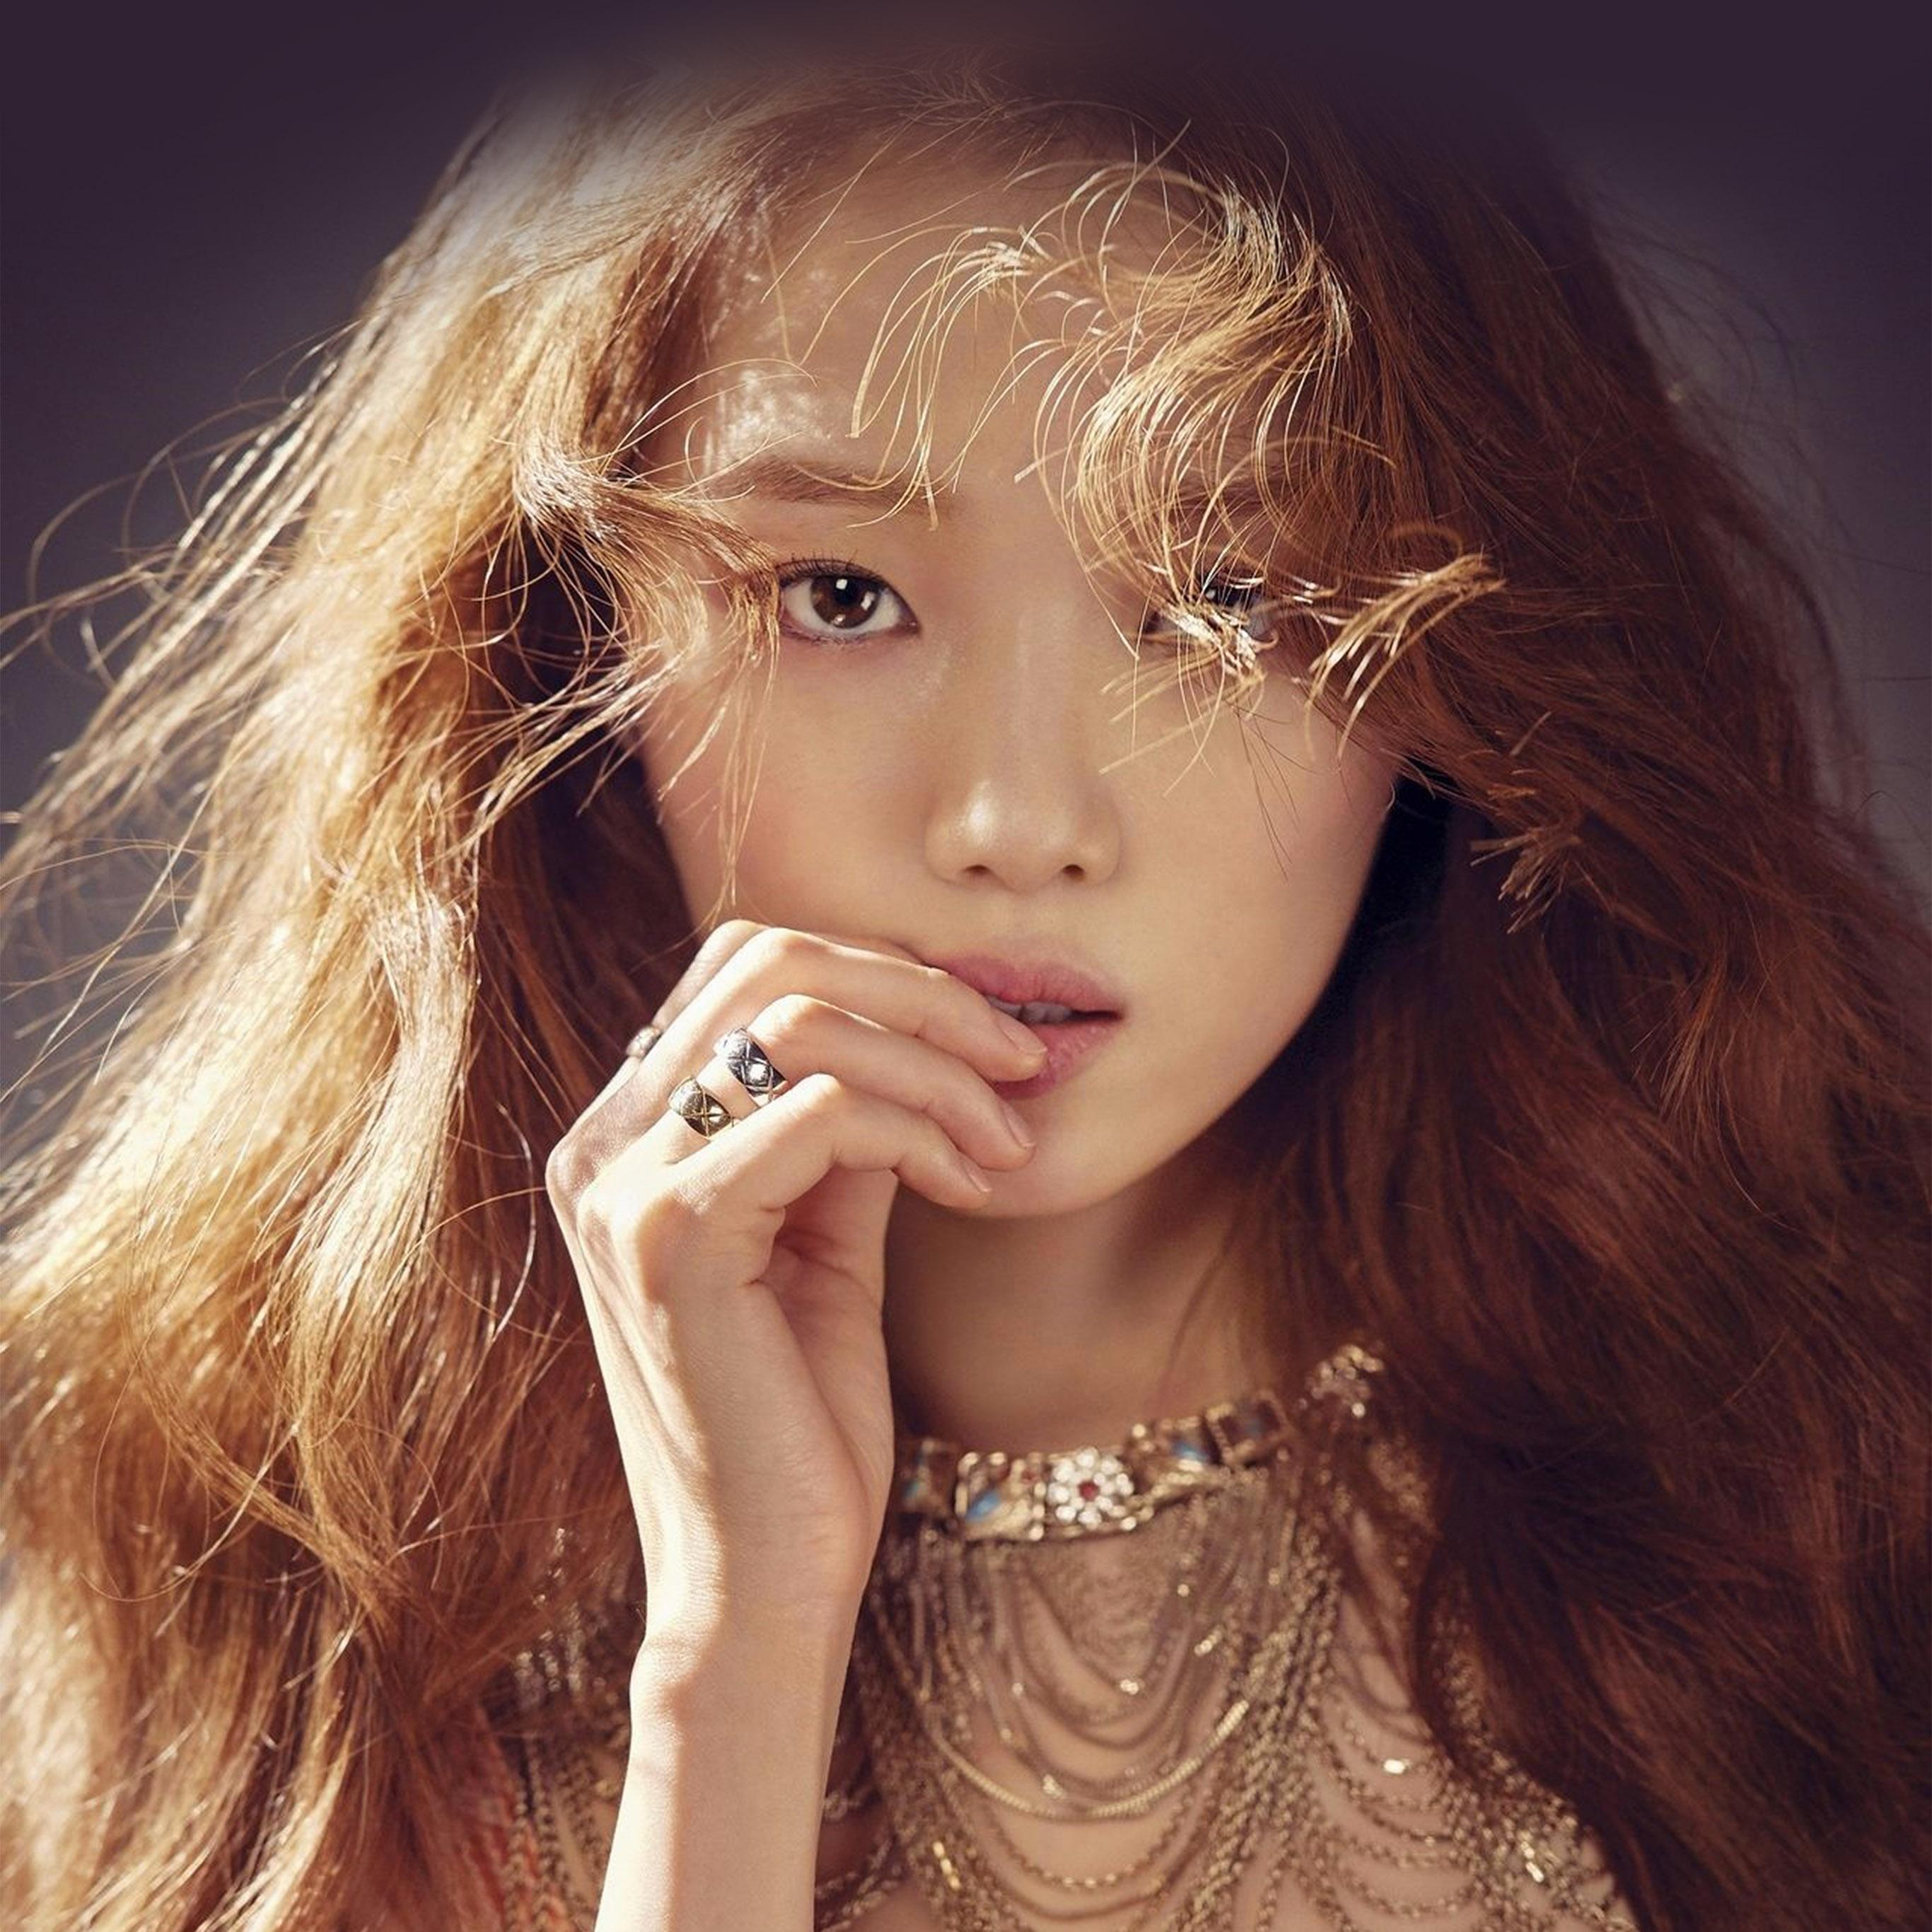 I Am A Simple Girl Wallpaper Ho68 Kpop Girl Model Asian Beauty Wallpaper